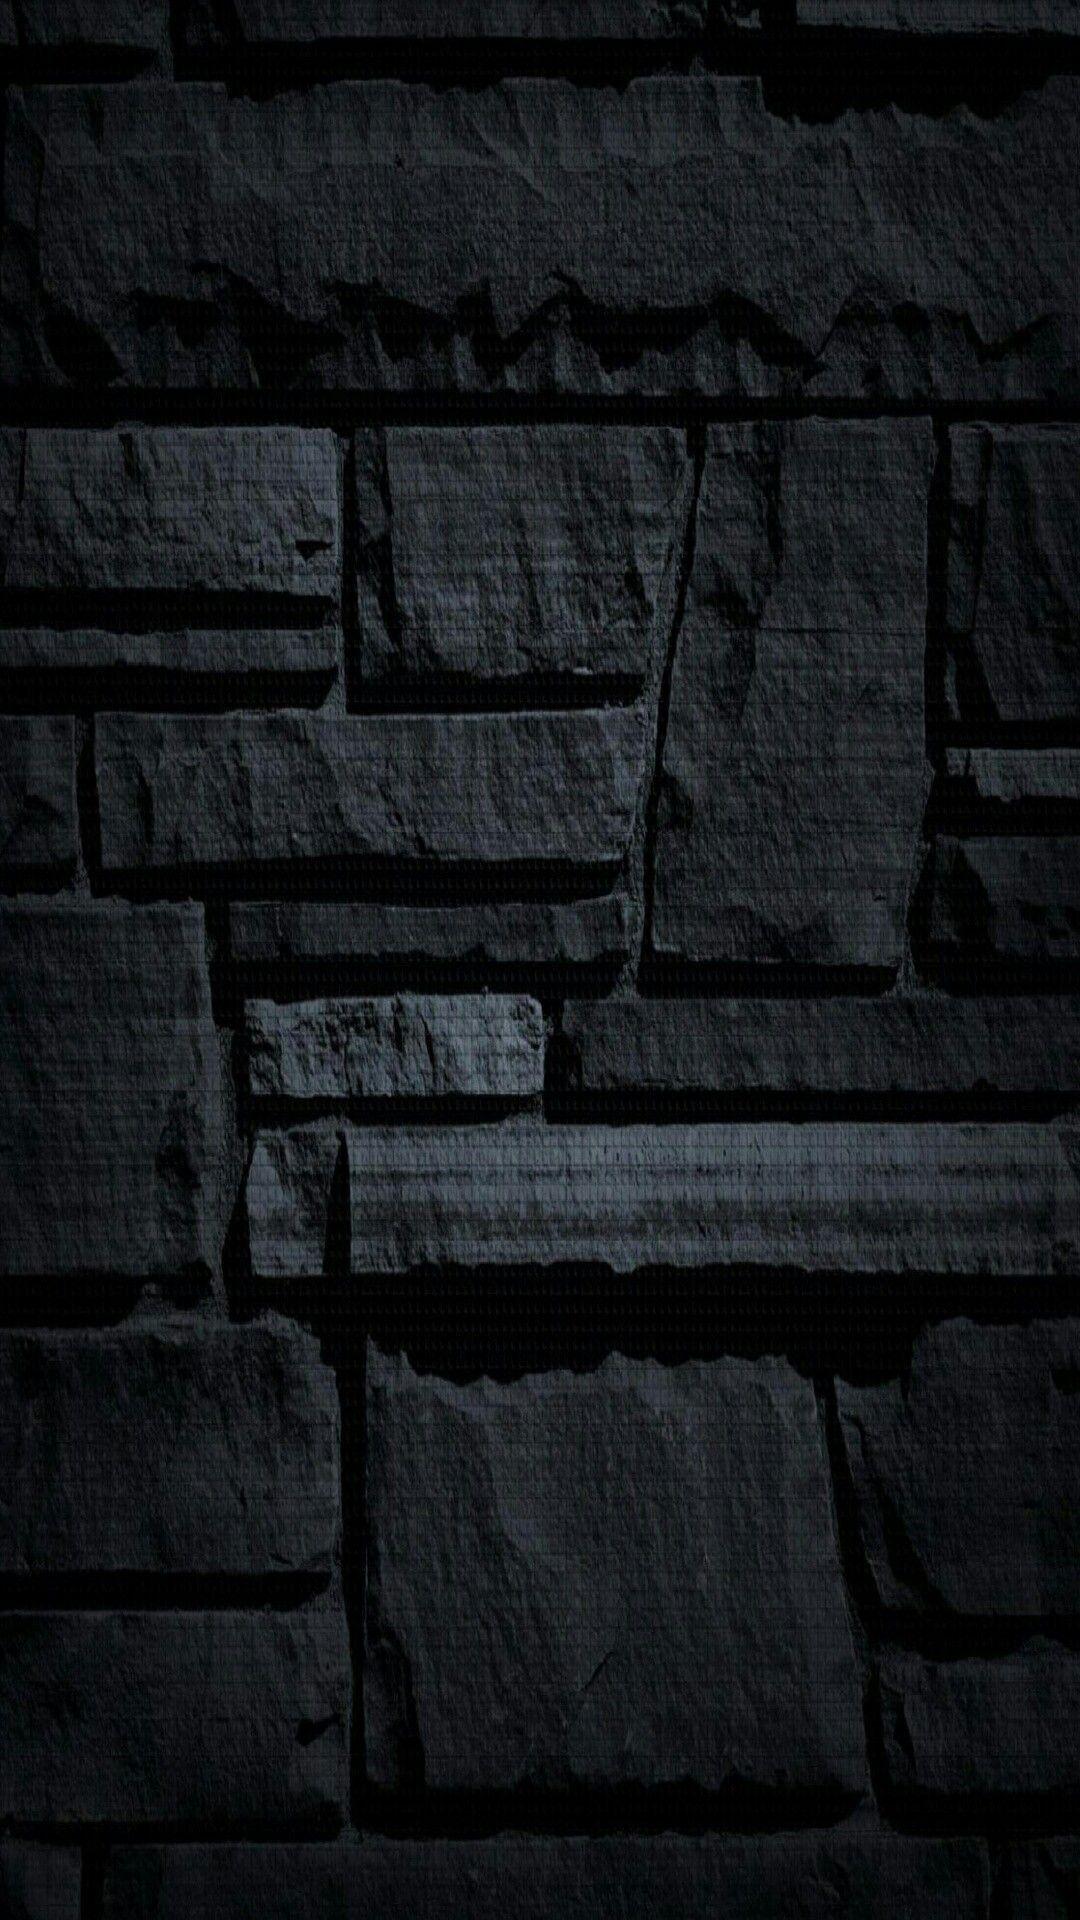 Black Royal Black Background Wallpaper Black Phone Wallpaper Black Wallpaper